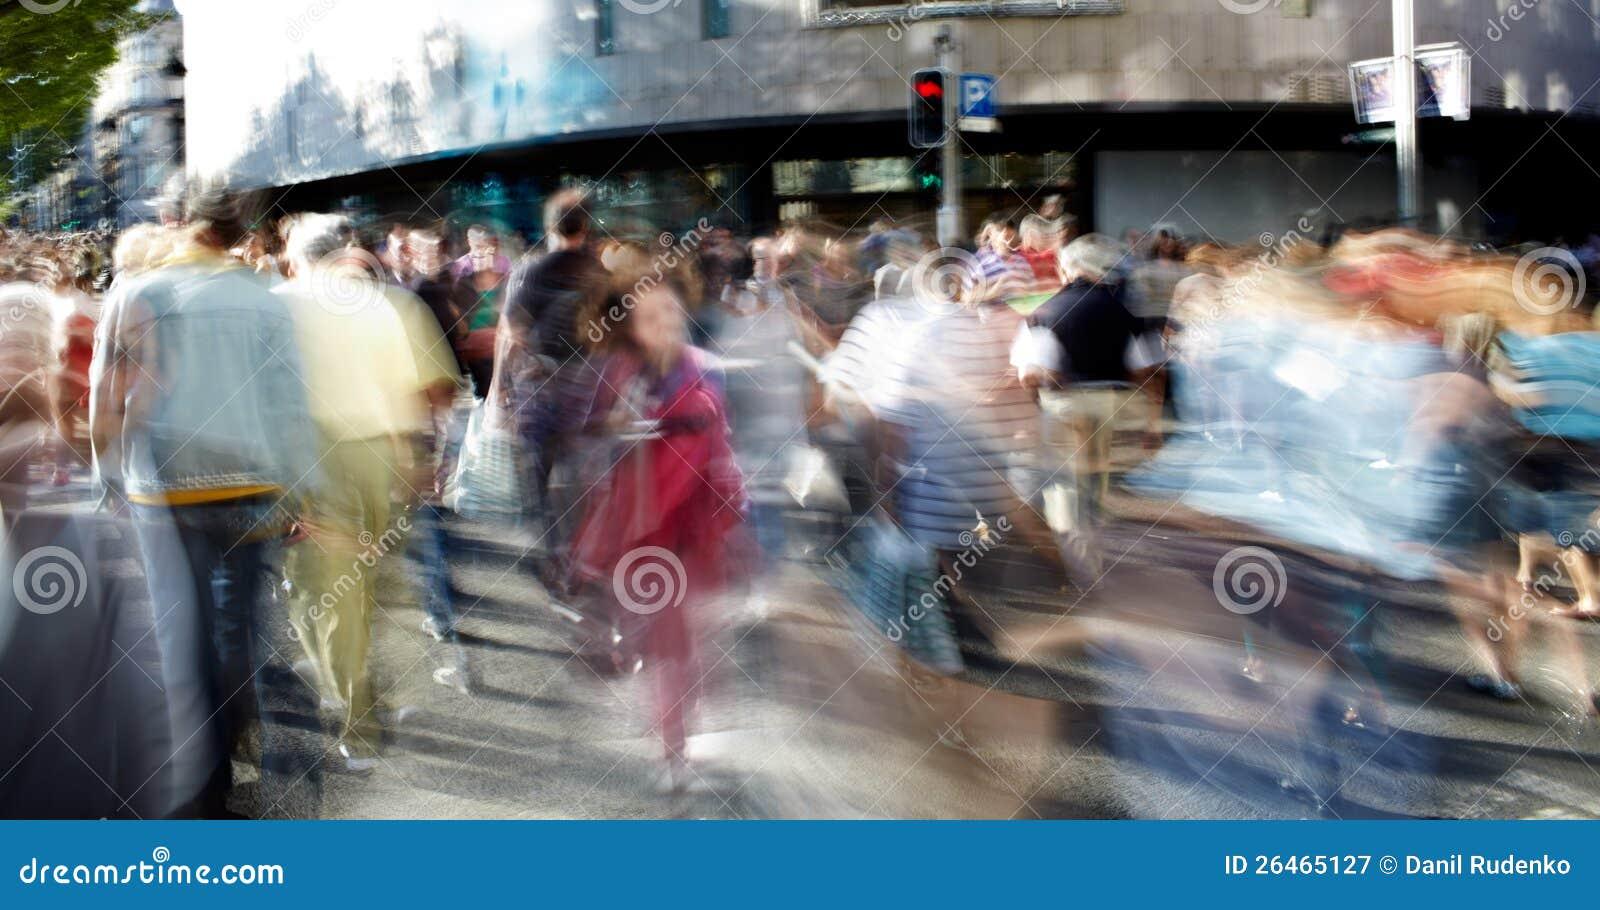 People crowd